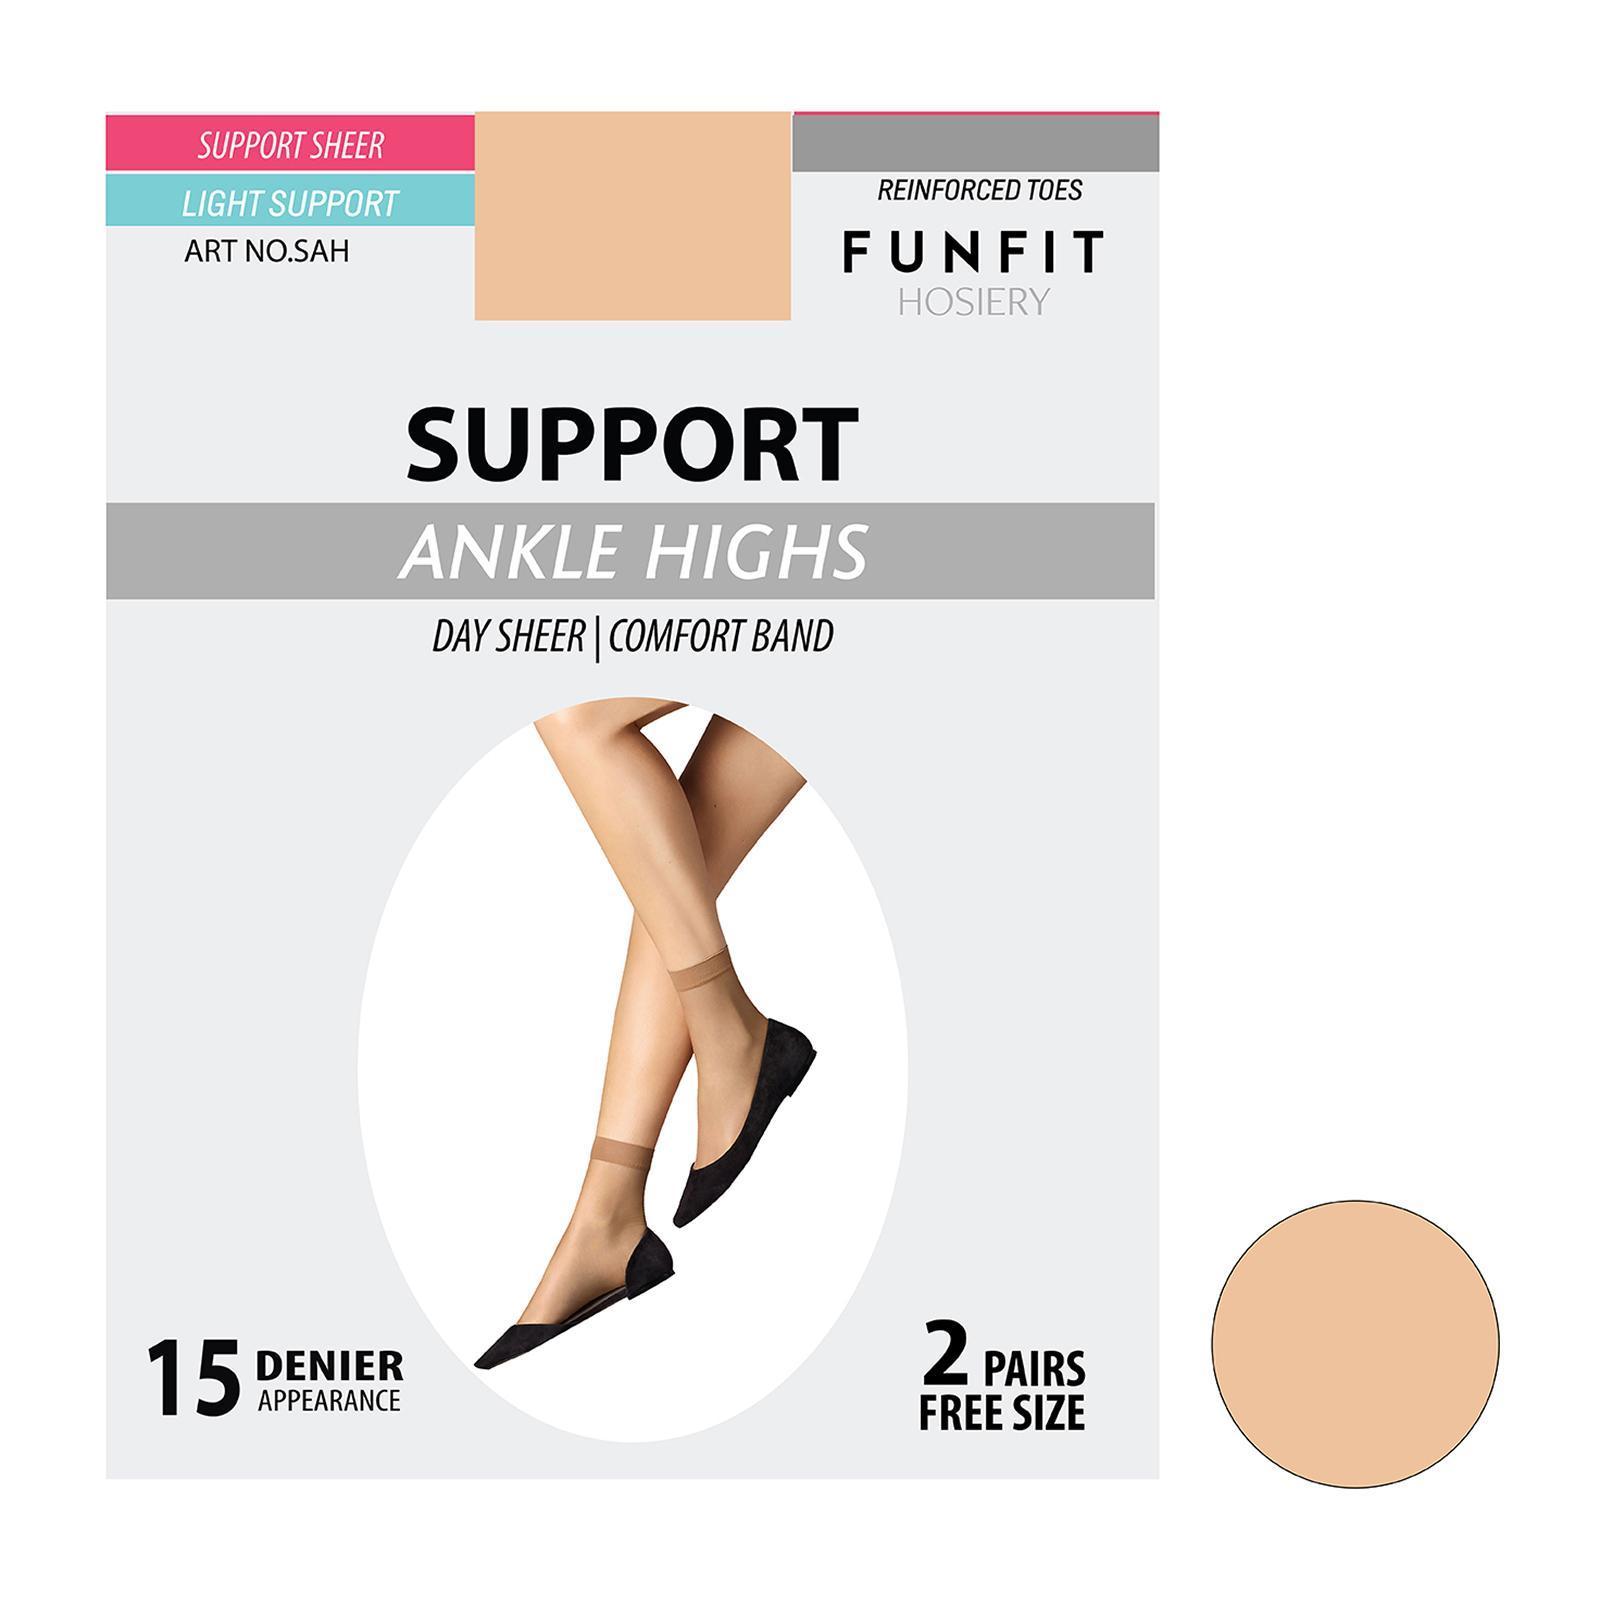 5e236e6d22a FUNFIT HOSIERY Medium Support Pantyhose (Plus Size) In Fair